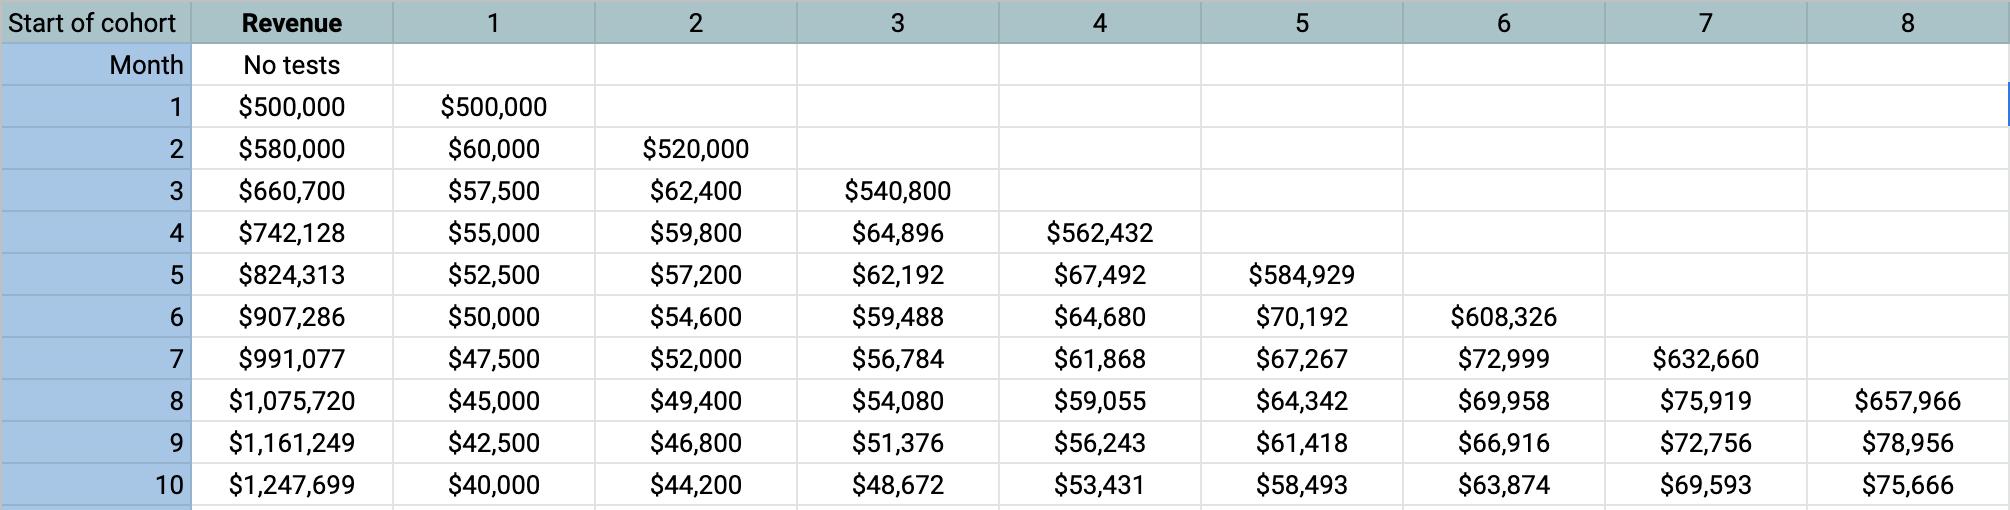 Cohort triangle with revenue